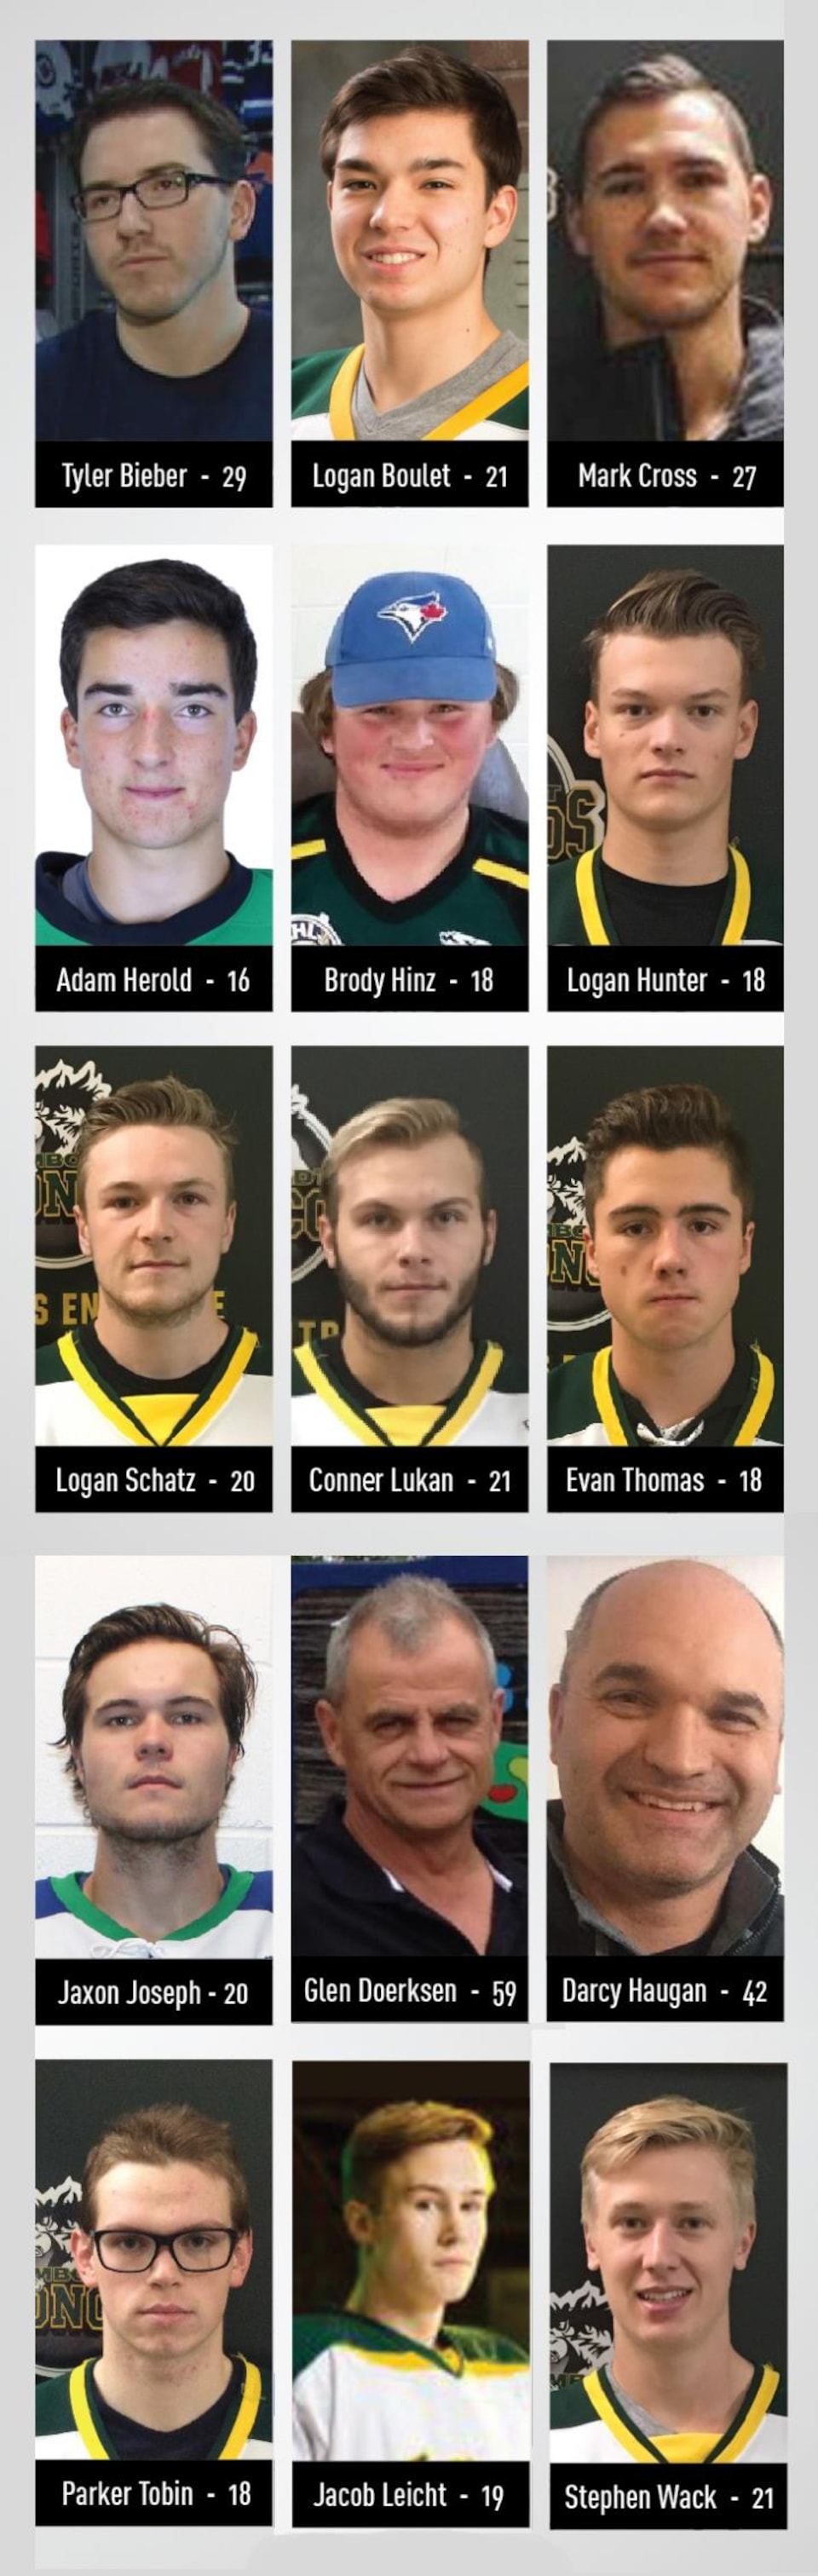 Identité des 15 victimes de l'accident : Tyler Bieber, 29 ans; Logan Boulet, 21 ans; Mark Cross, 27 ans; Glen Doerksen, 59 ans; Darcy Haugan, 42 ans; Adam Herold, 16 ans; Brody Hinz, 18 ans; Logan Hunter, 18 ans; Jaxon Joseph, 20 ans; Jacob Leicht, 19 ans; Logan Schatz, 20 ans; Connor Lukan, 21 ans; Evan Thomas, 18 ans; Parker Tobin, 18 ans; Stephen Wack, 21 ans.